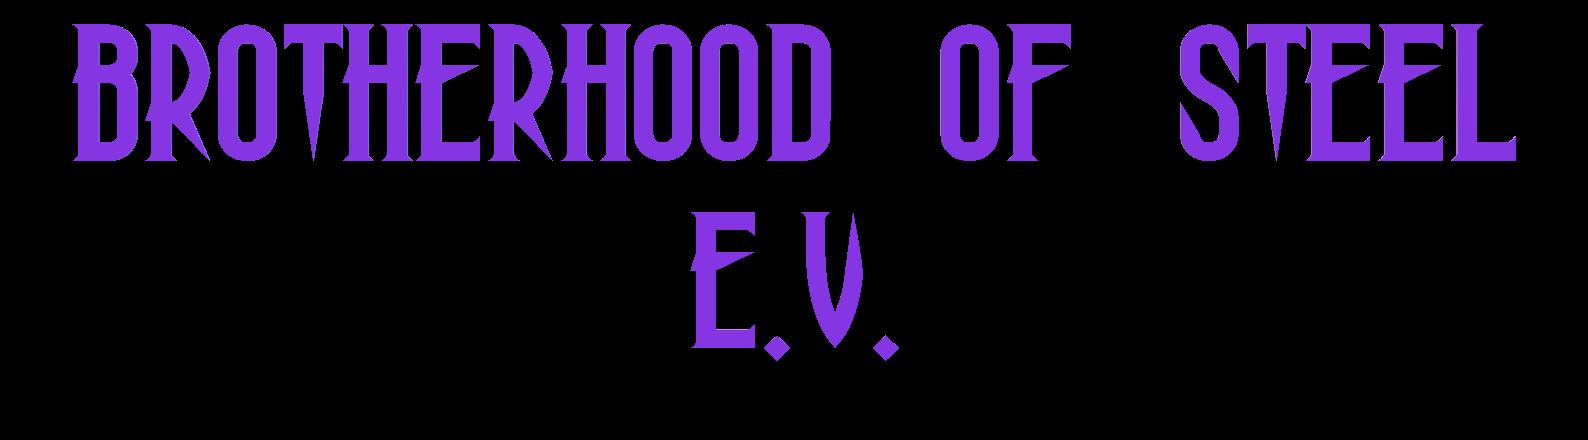 Brotherhood of Steel e.V.